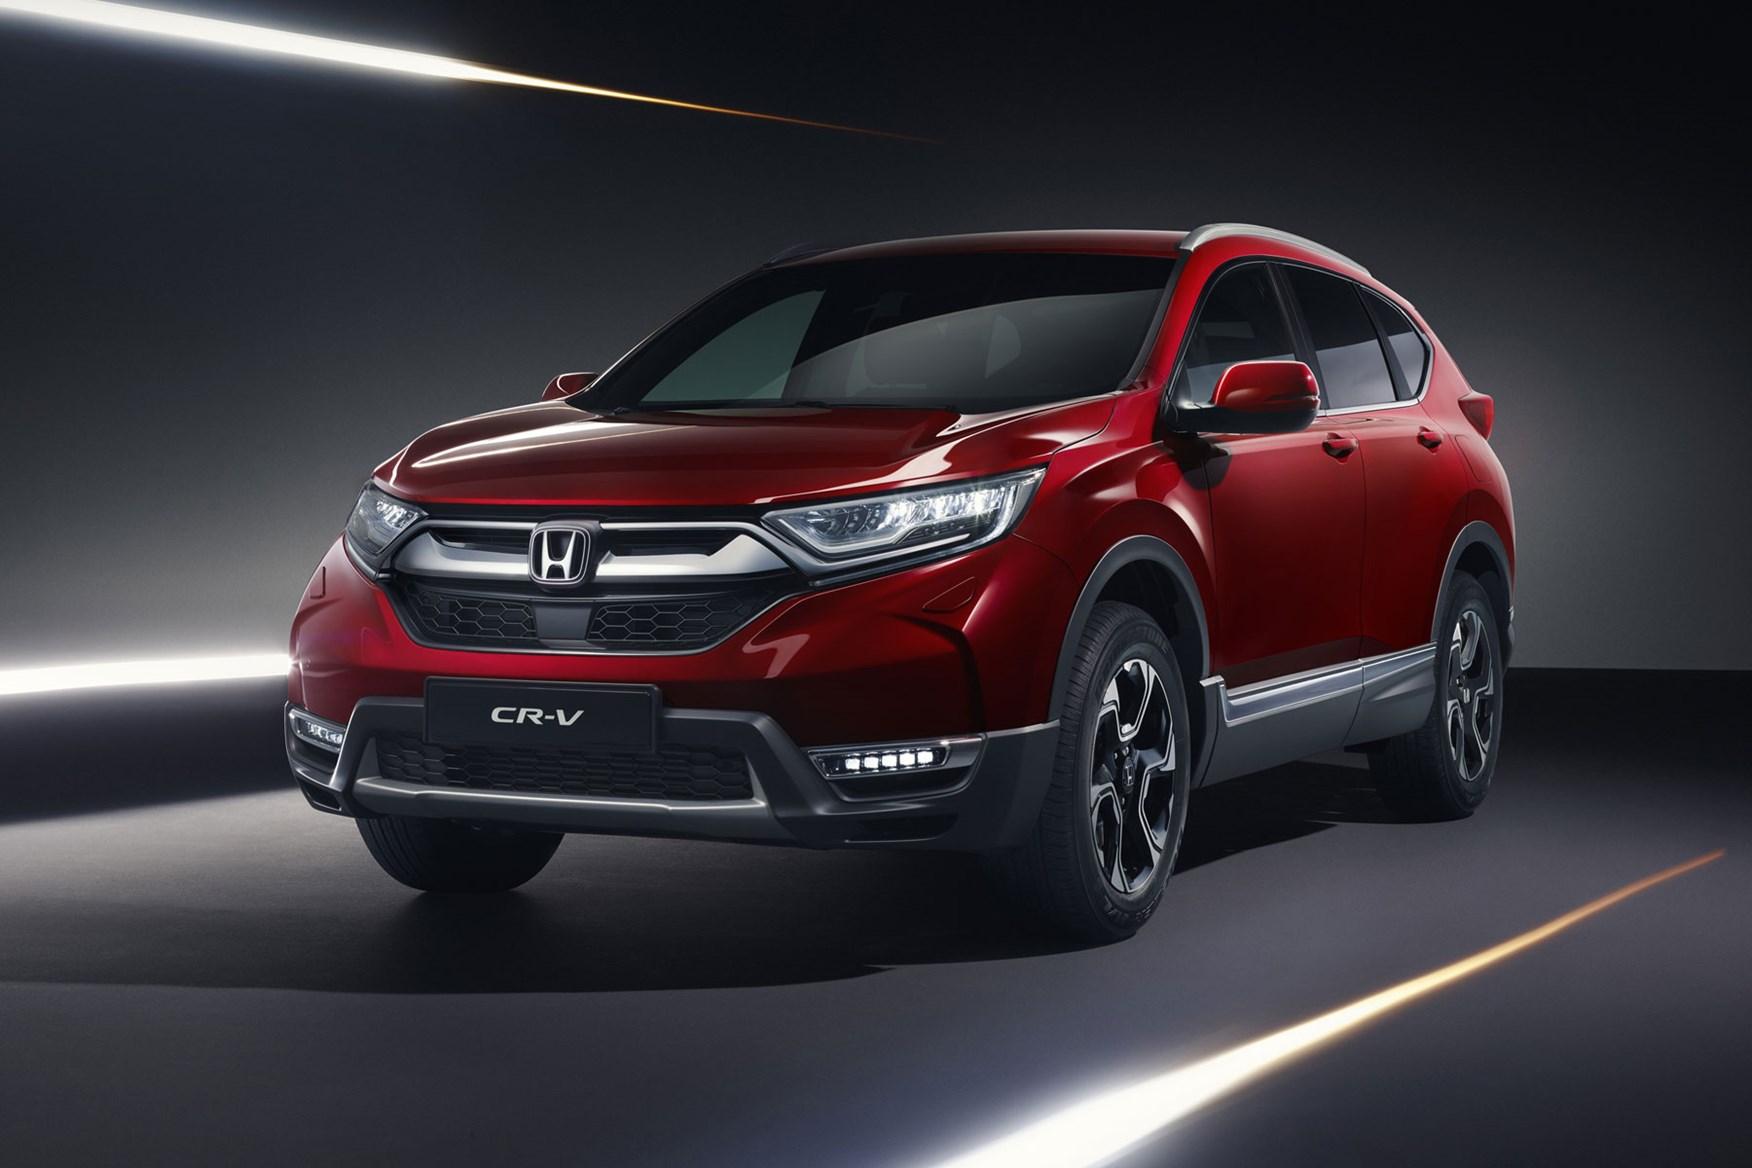 Honda CR-V (2018): news, info, pics, spec, hybrid | CAR Magazine